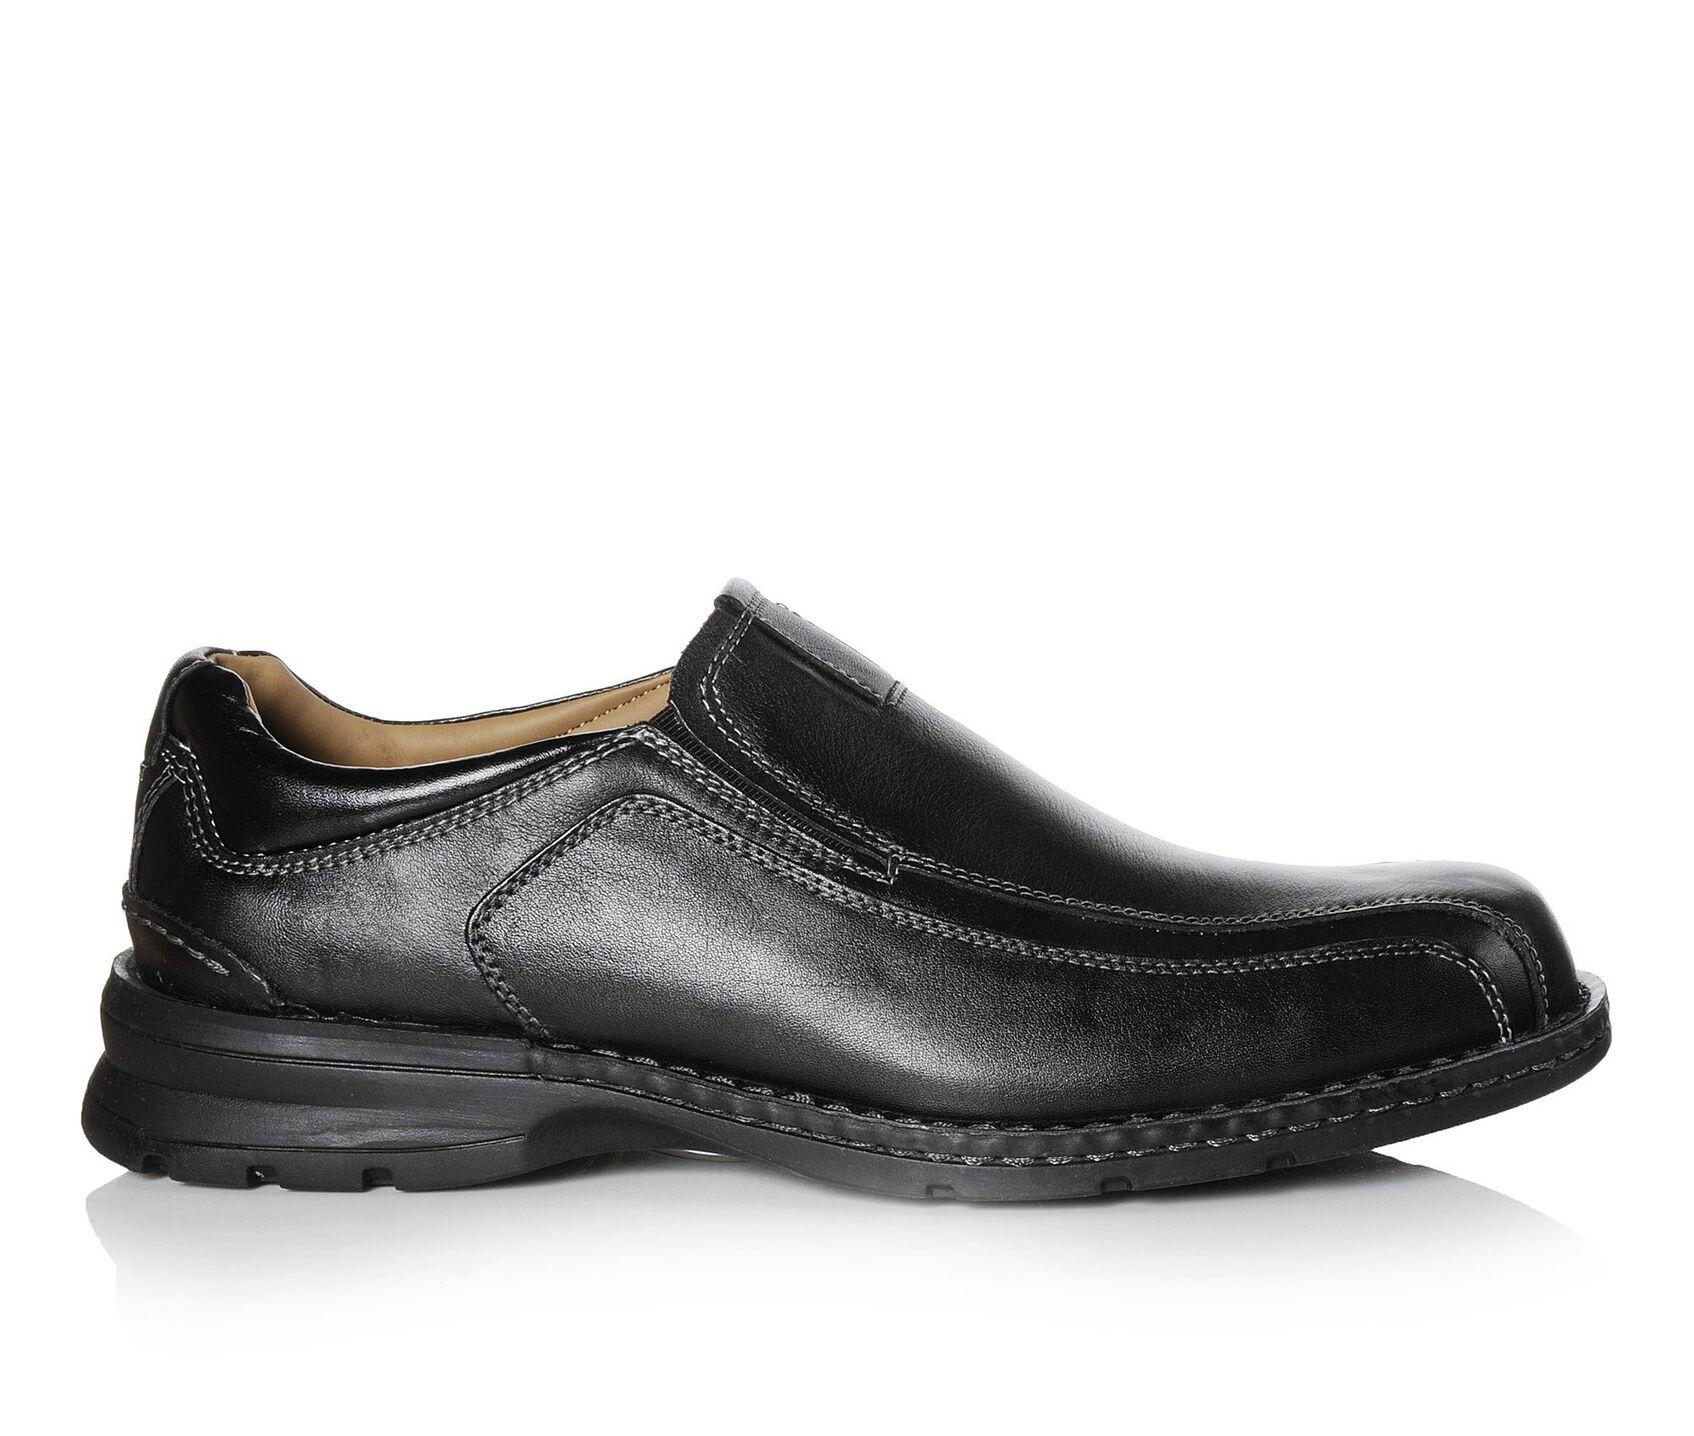 021c9eb4620 Men s Dockers Agent 90-29034 Slip-On Shoes